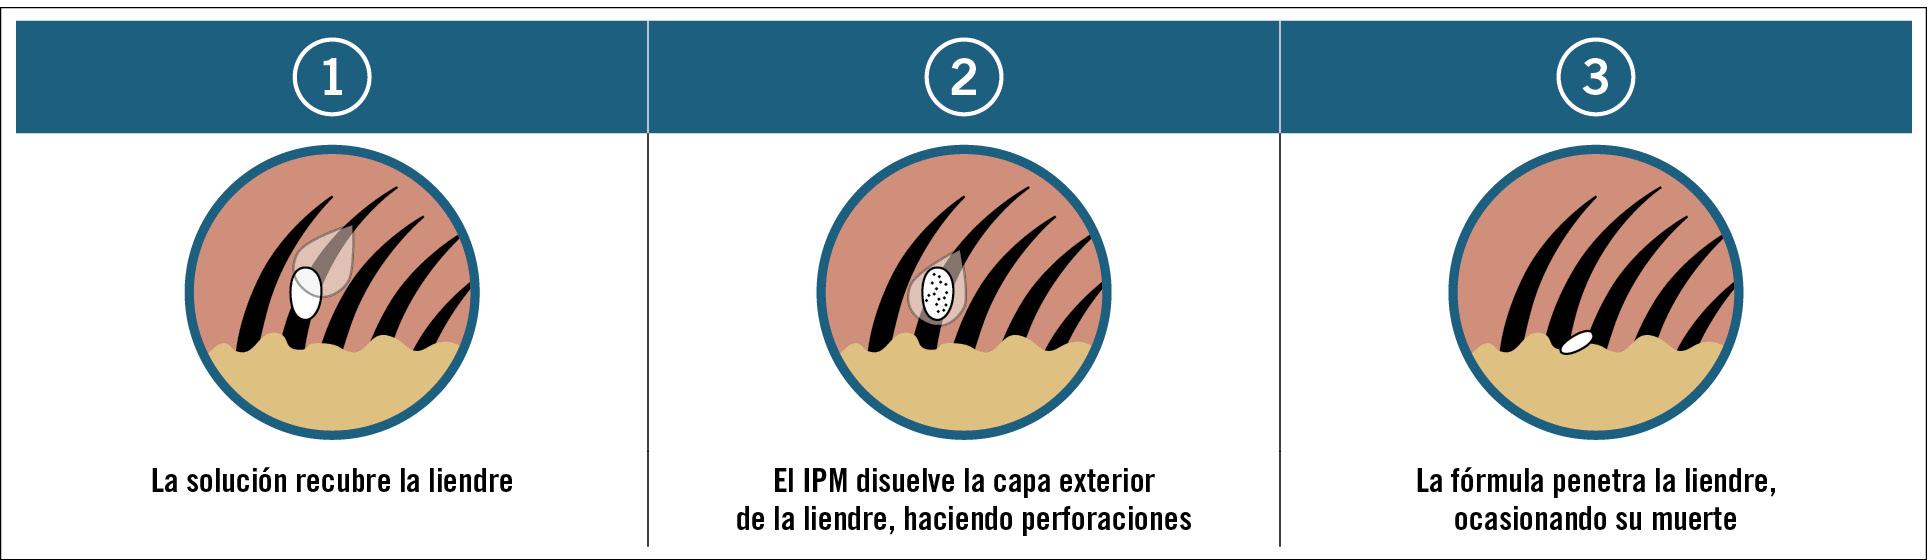 21 EF587 PROFESION pediculosis Figura 2